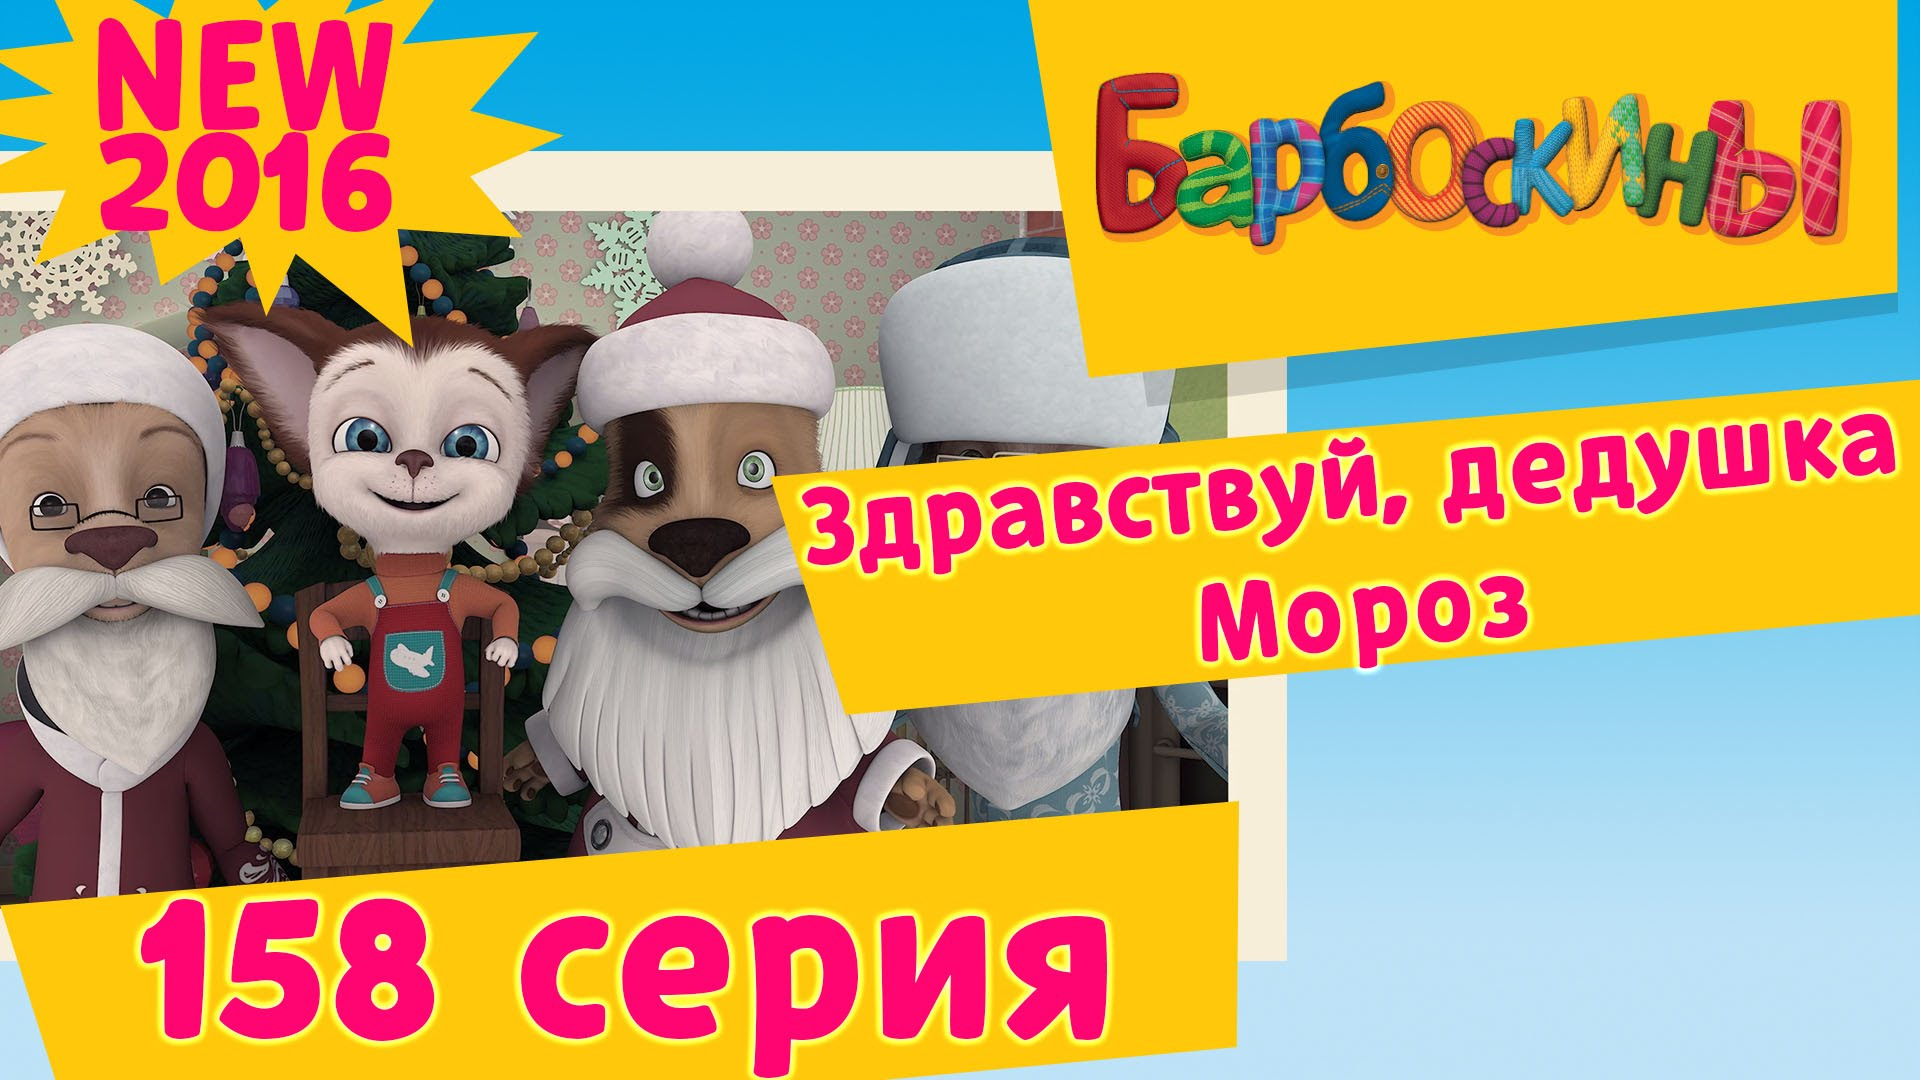 Барбоскины — 158 серия. Здравствуй, Дедушка Мороз.